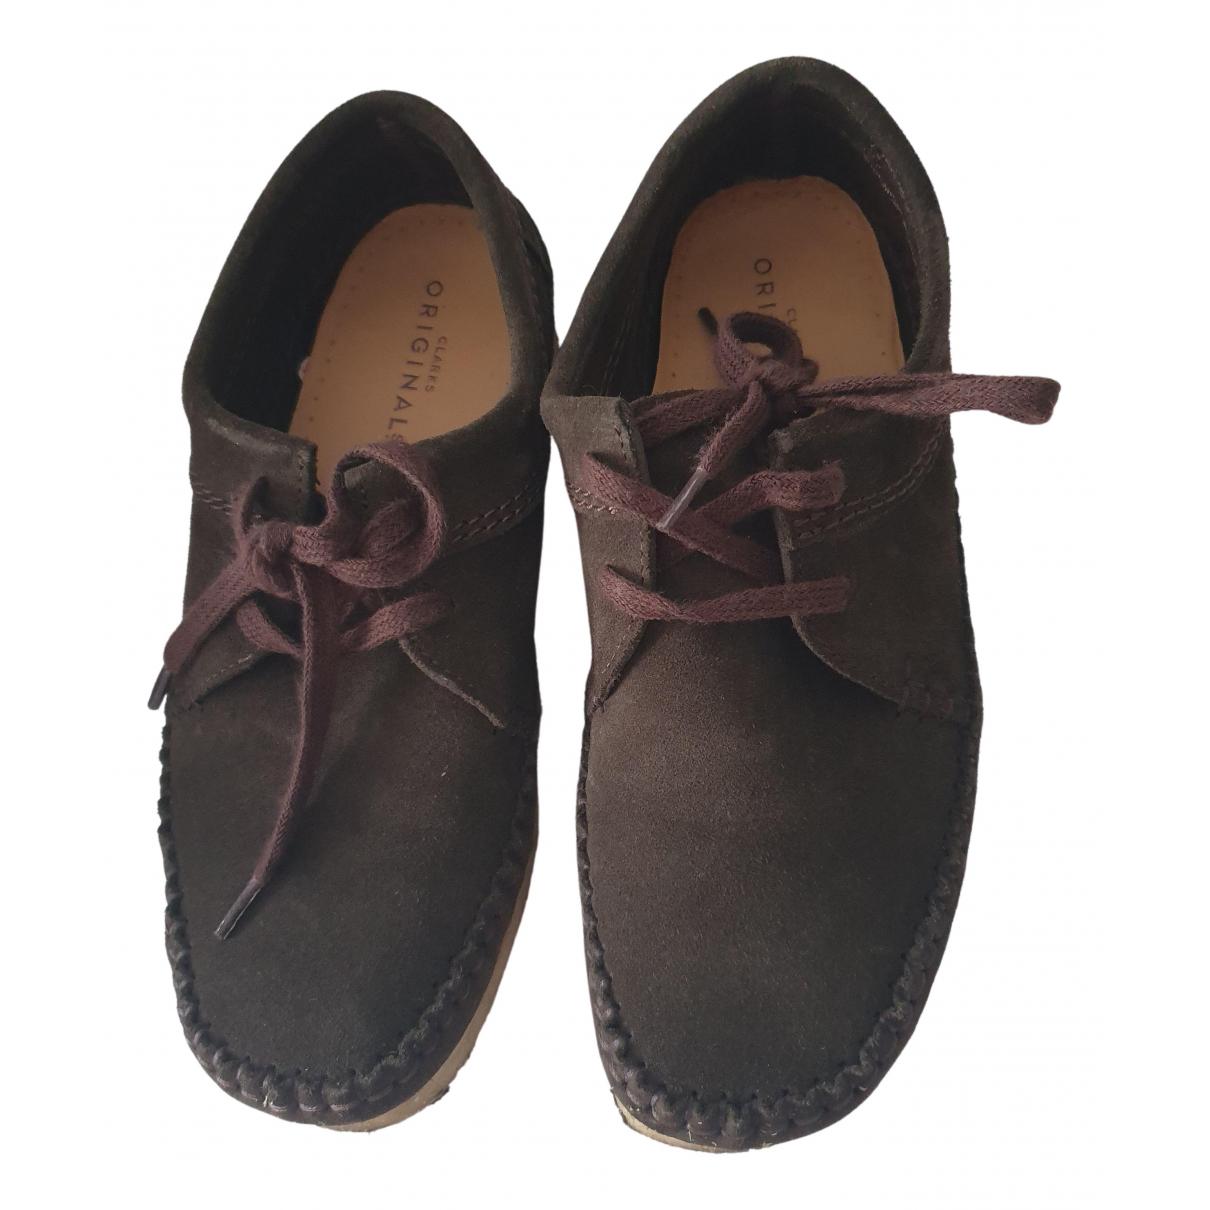 Clarks N Khaki Leather Flats for Women 38 EU